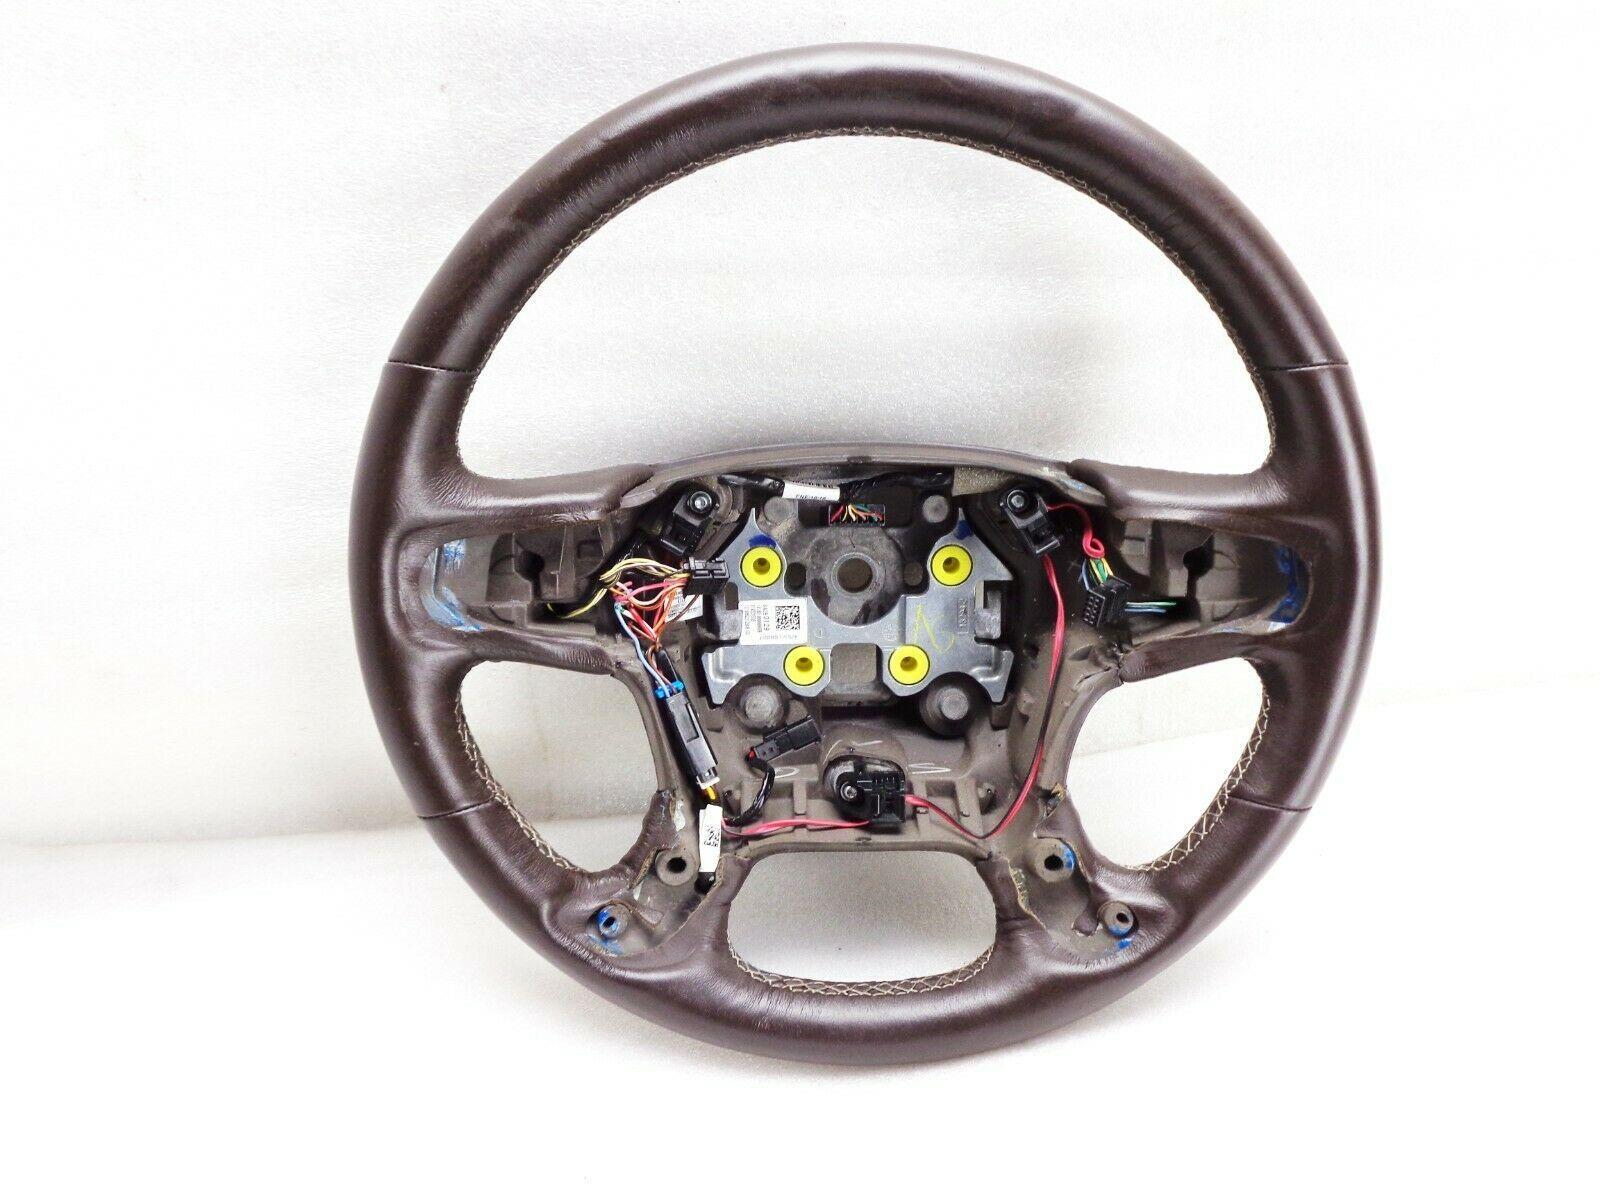 2016-2017-2018-2019 GMC Yukon Denali Steering Wheel Brown Leather Original OEM - $59.95